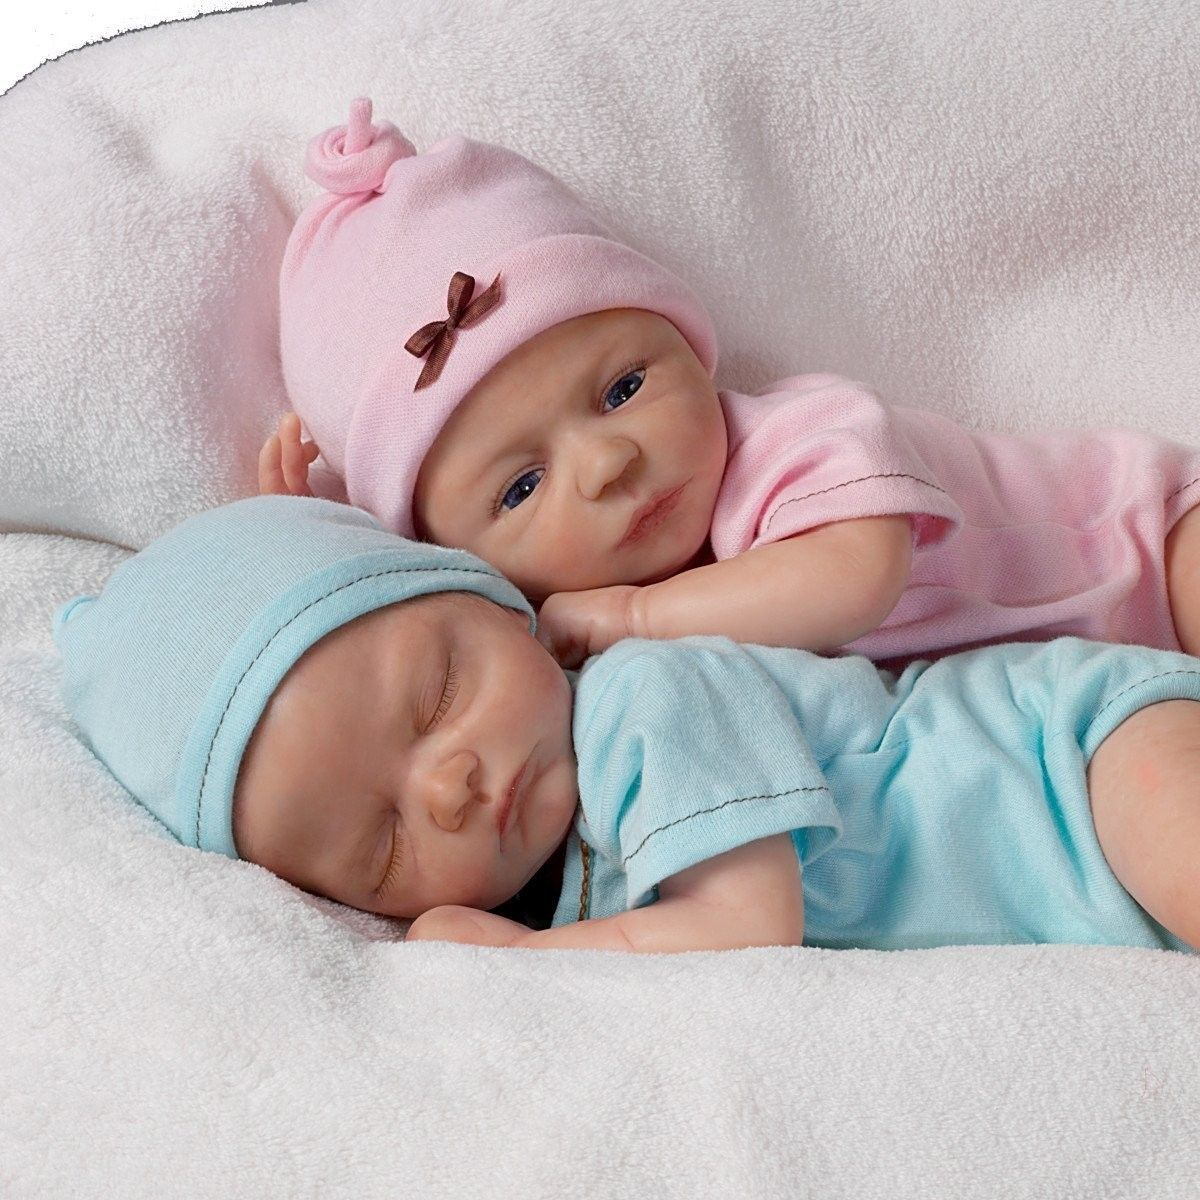 ashton drake Google Search Baby doll set, Baby dolls